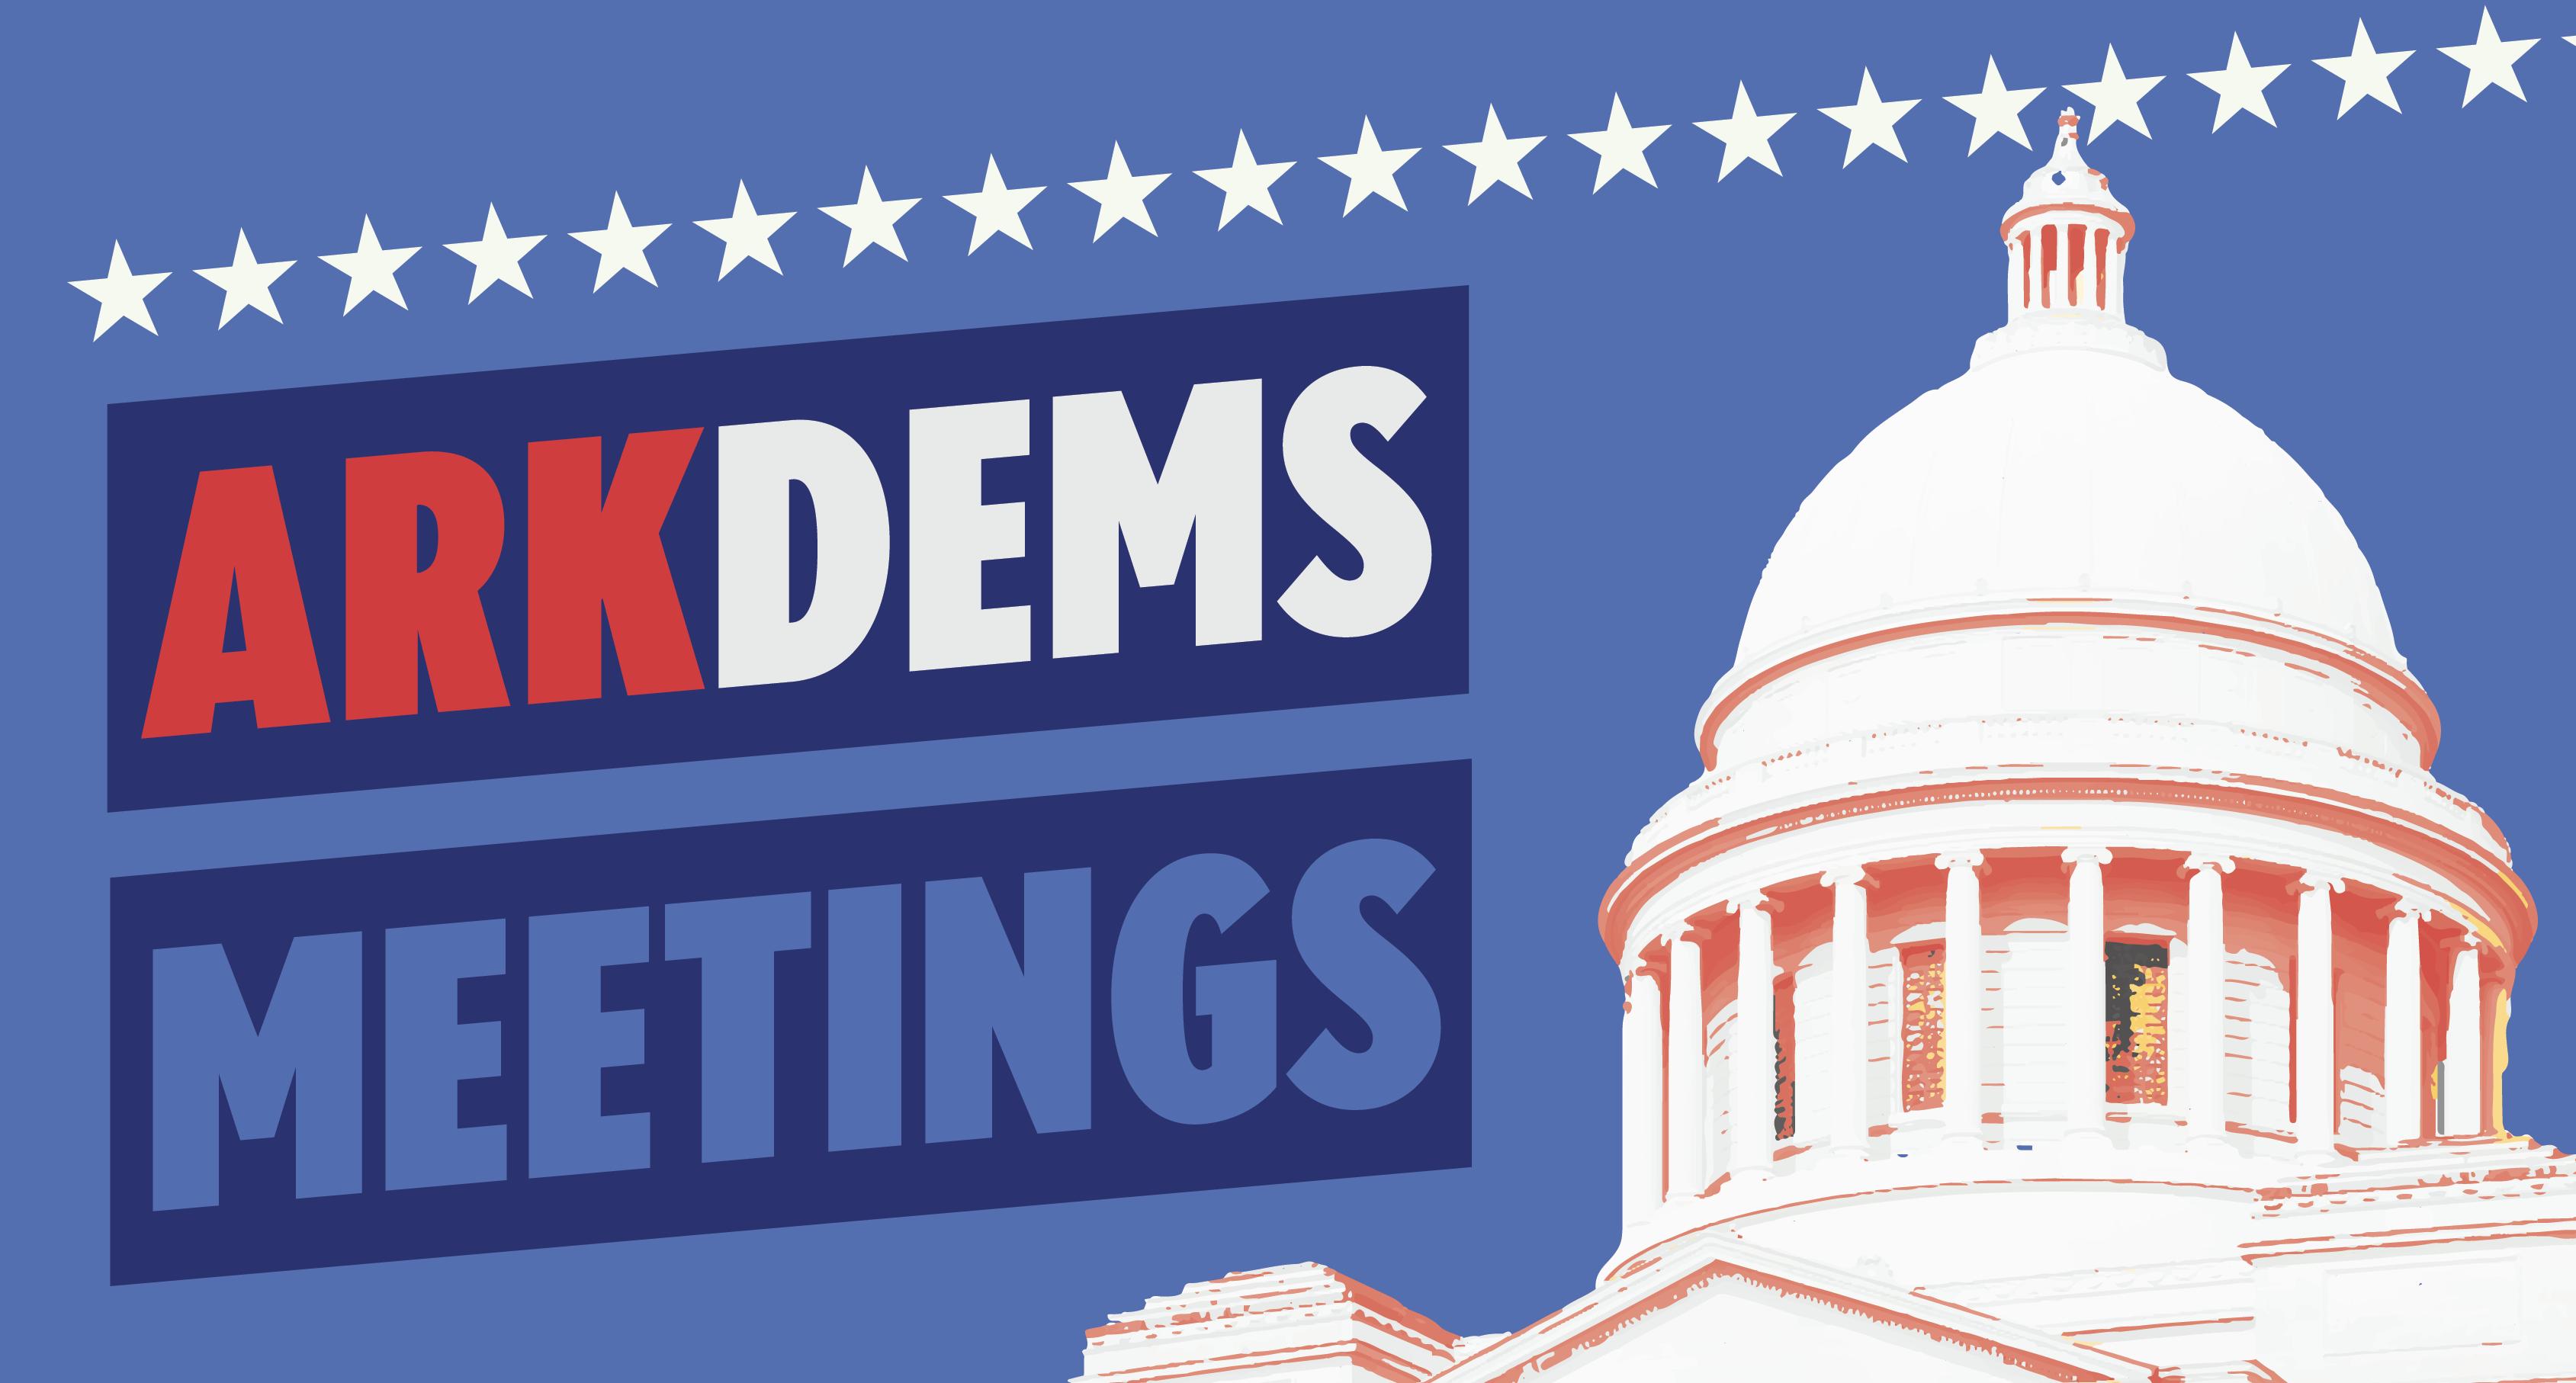 ArkDems Meetings!